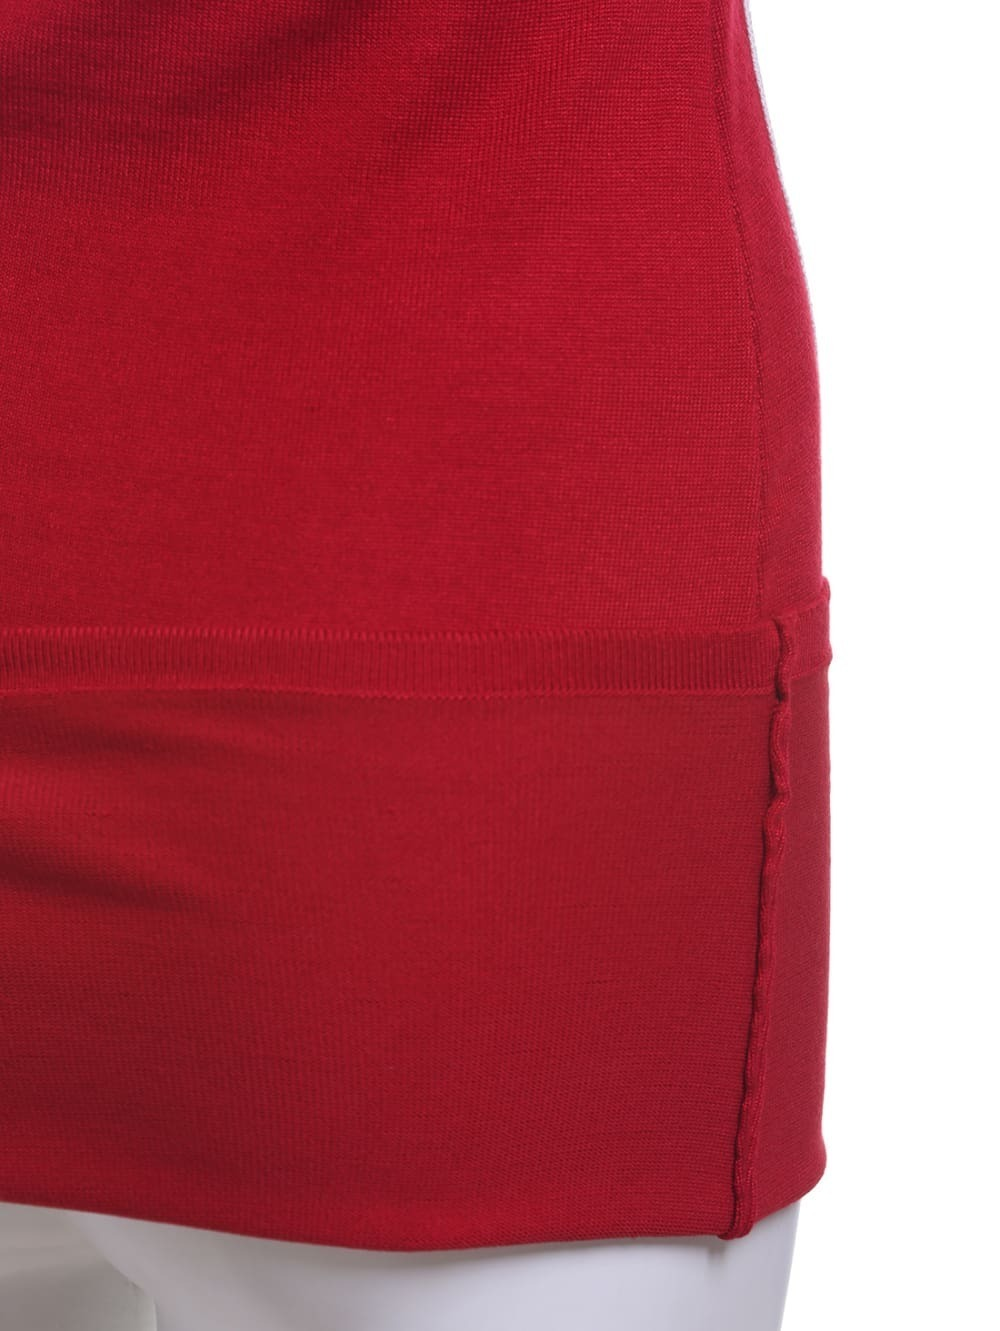 Vestido contraste tubo rojo spanish romwe for Tubo corrugado rojo precio